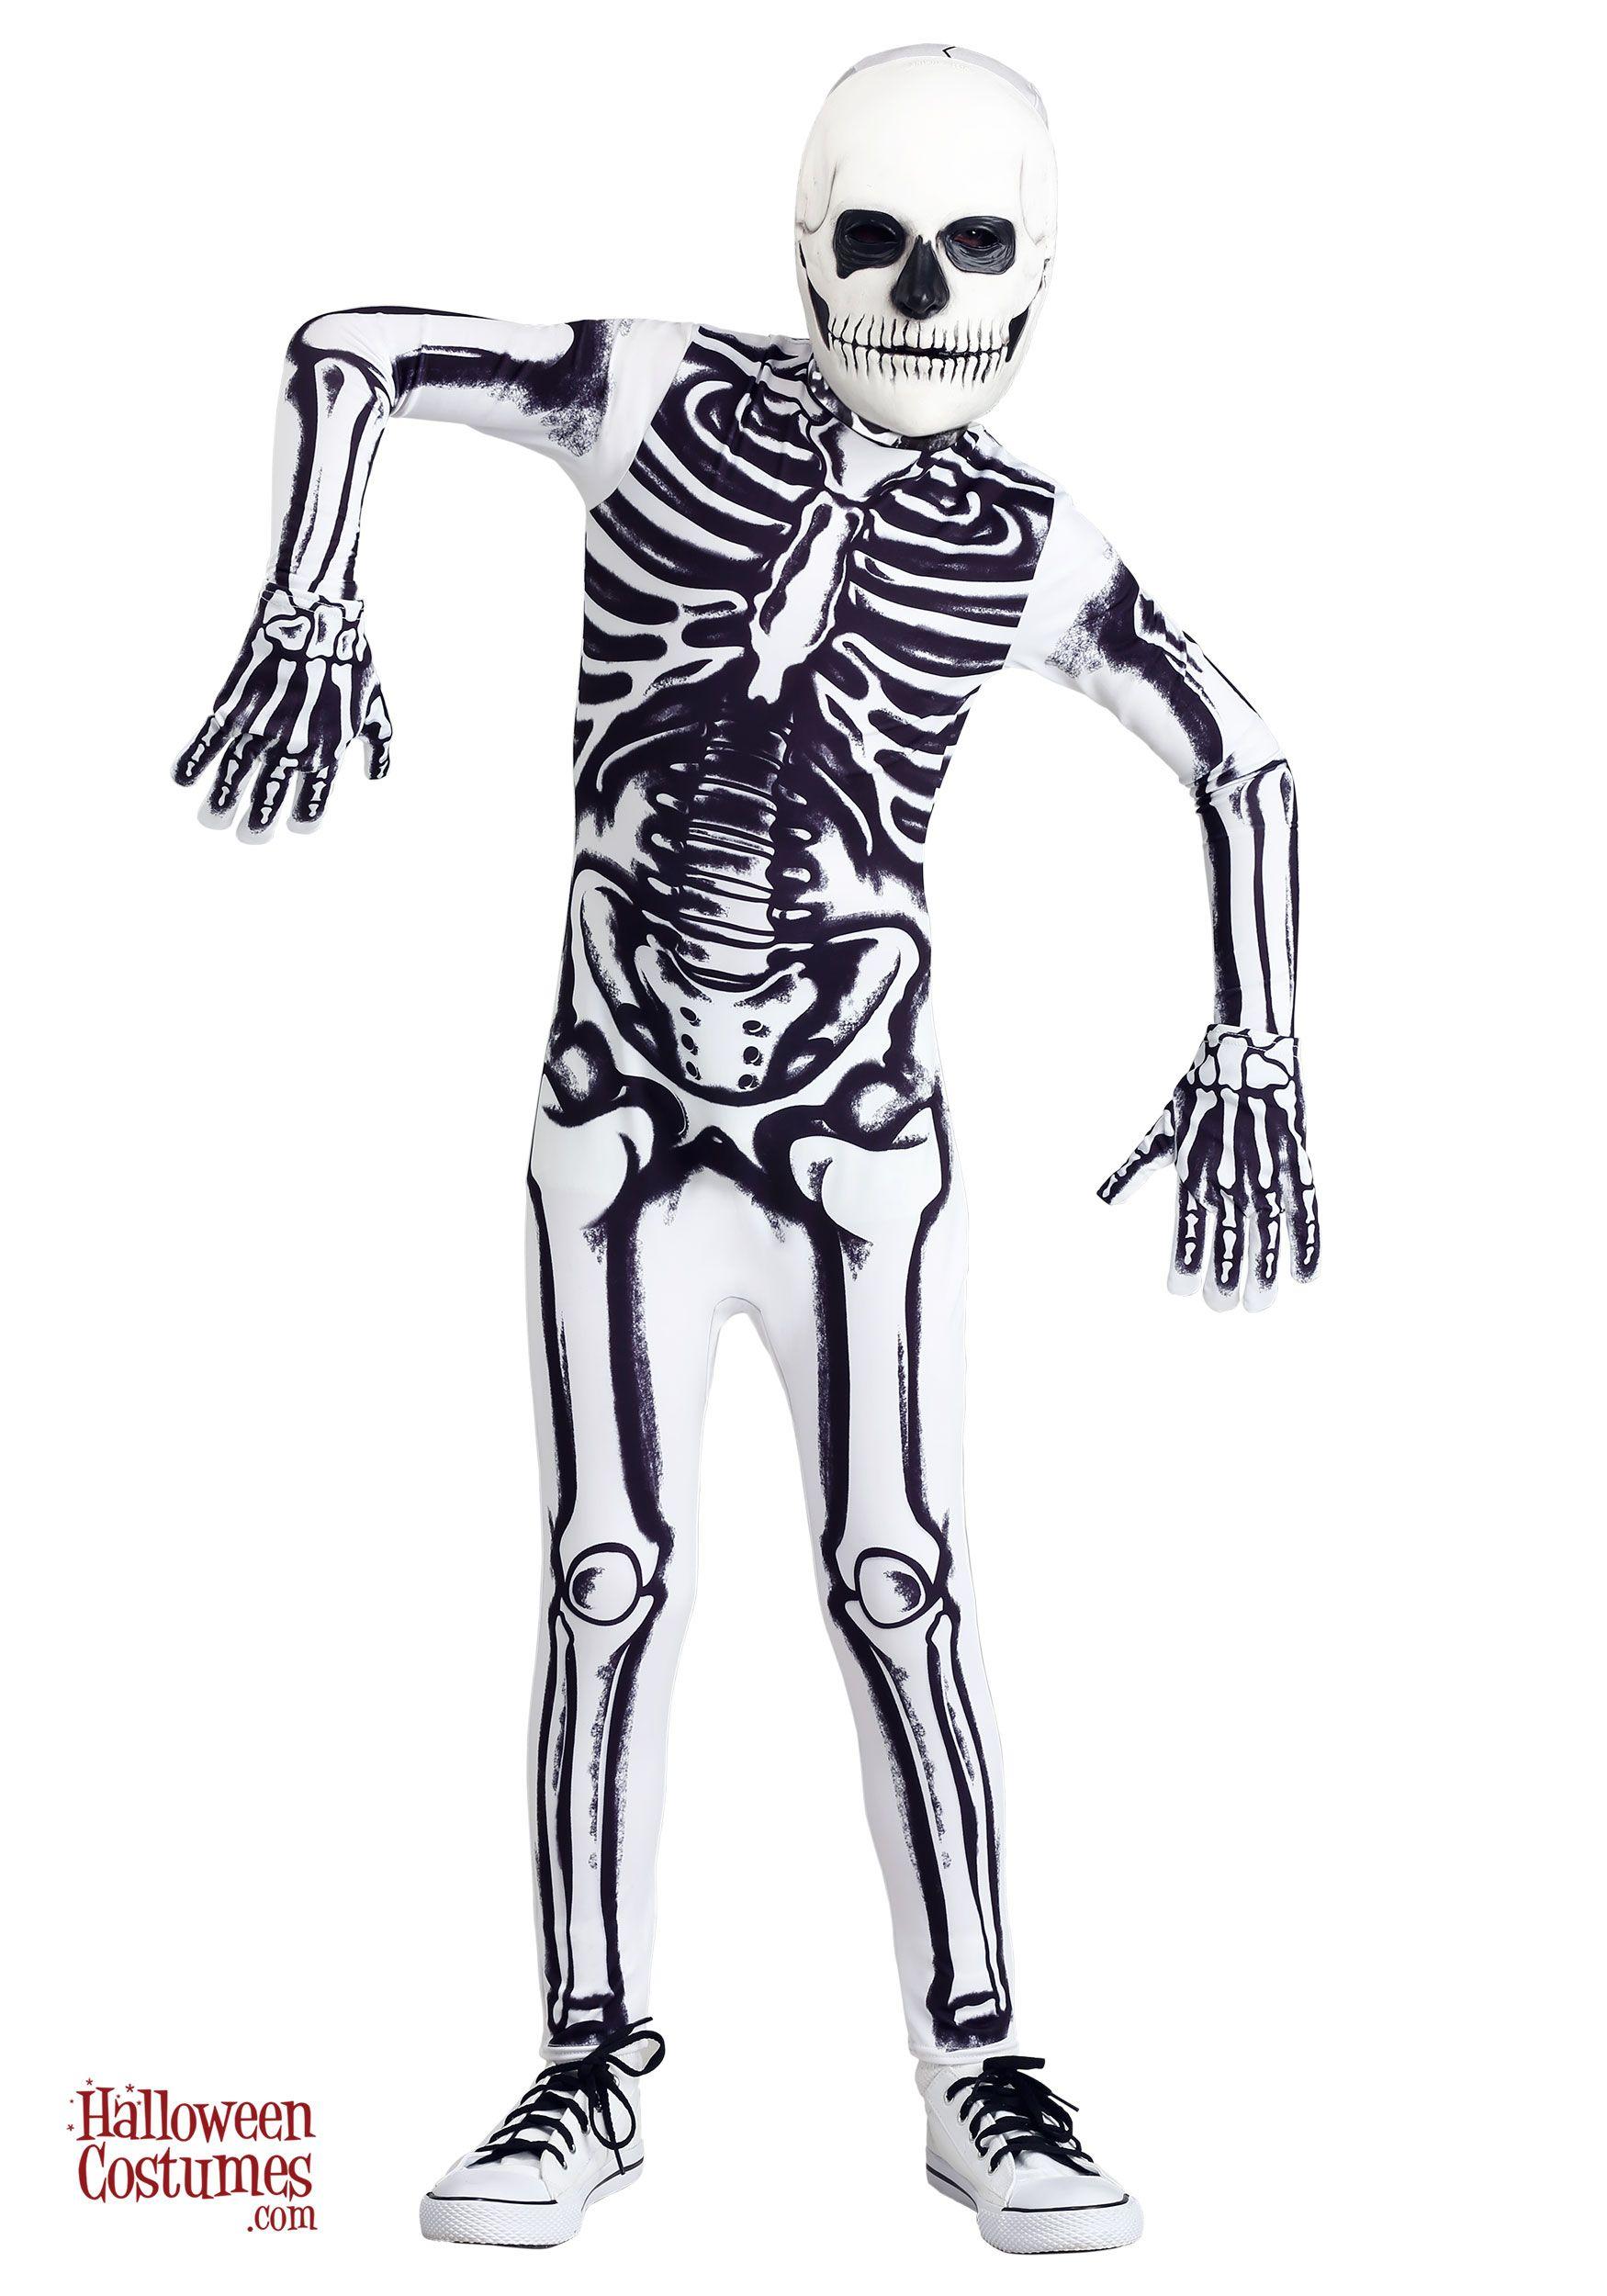 White Skeleton Costume For Kids In 2021 Skeleton Halloween Costume Skeleton Costume Kids Skeleton Costume